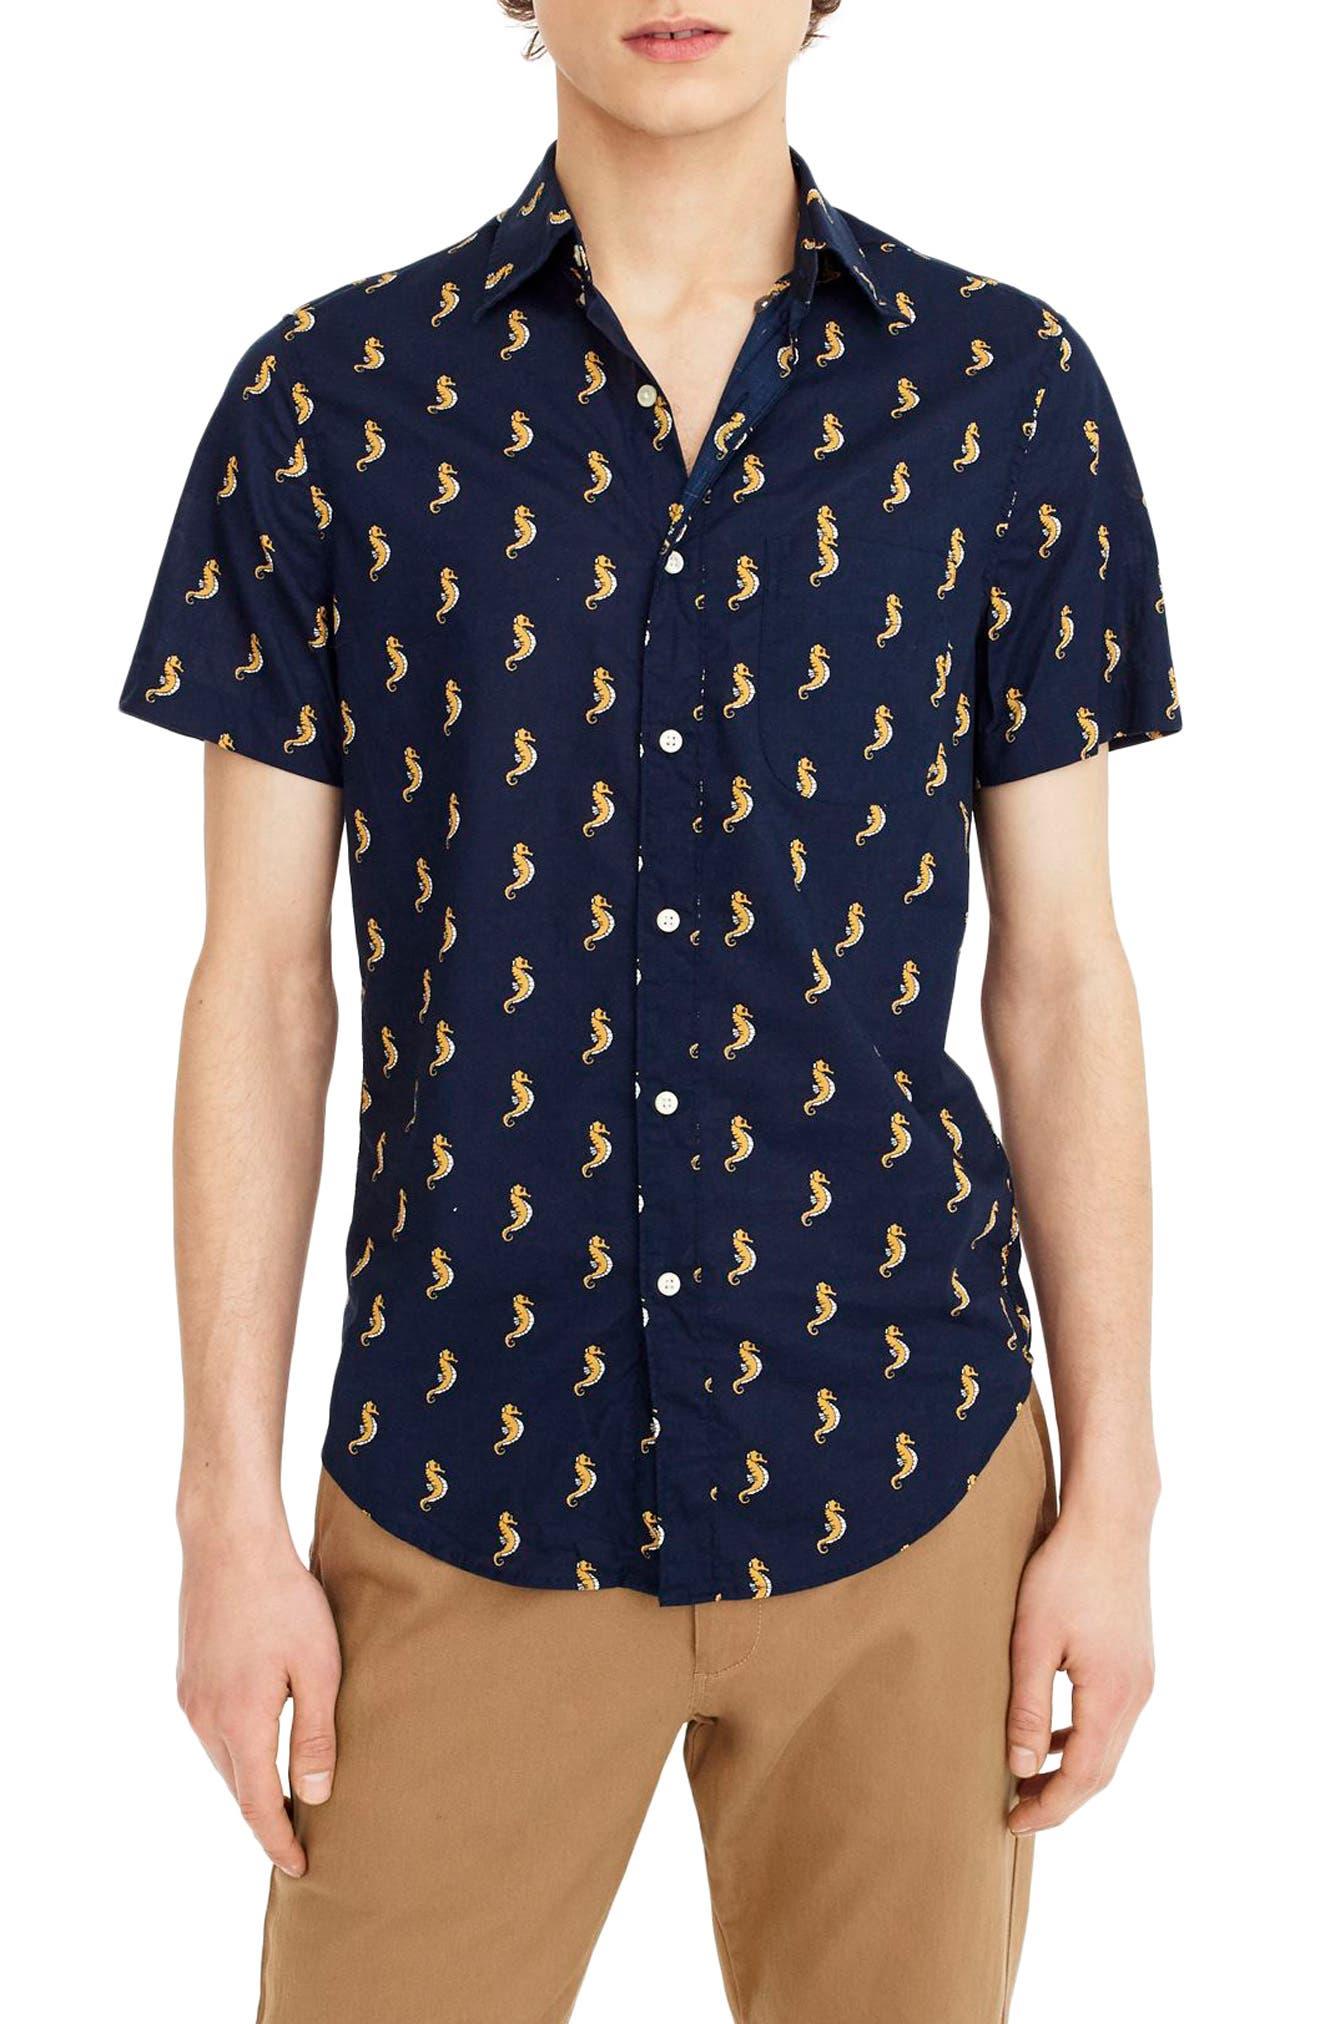 J.Crew Slim Fit Secret Wash Short Sleeve Seahorse Print Sport Shirt